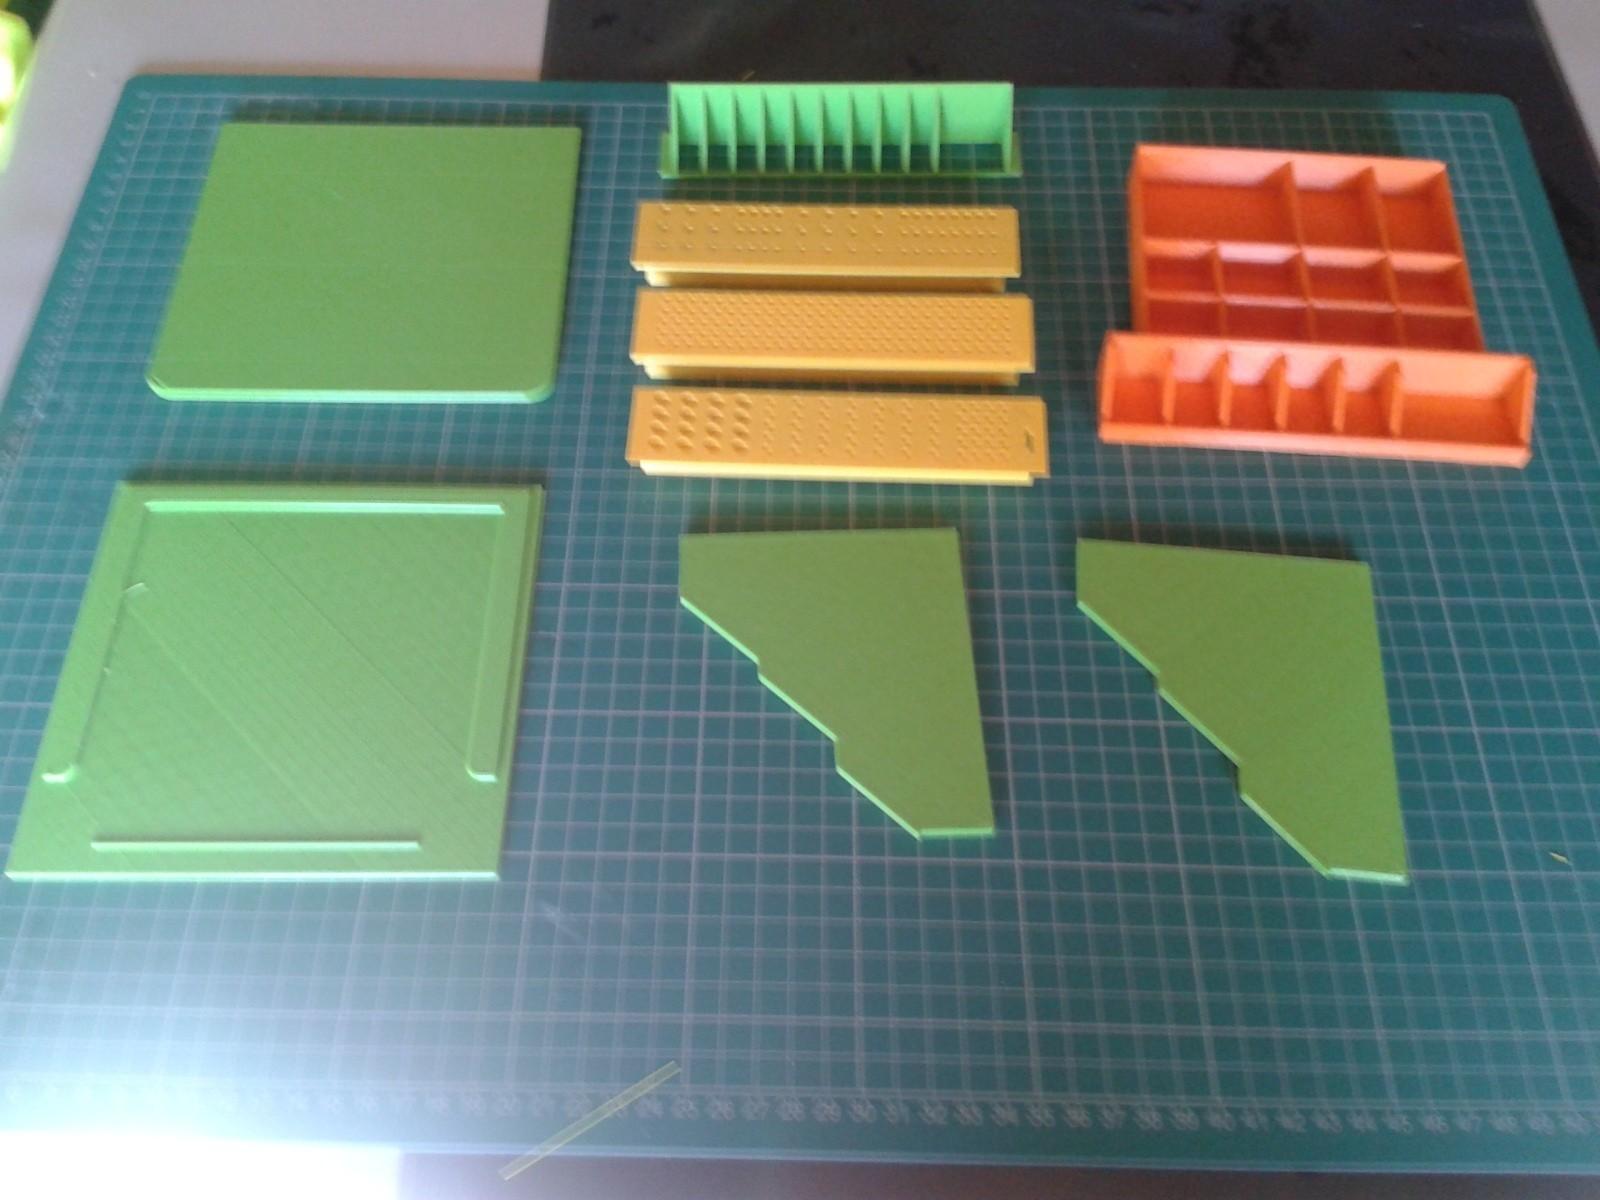 20160506_091007.jpg Download STL file Module for mini drill and c is accessory N ° 2 • 3D printer model, prusai33